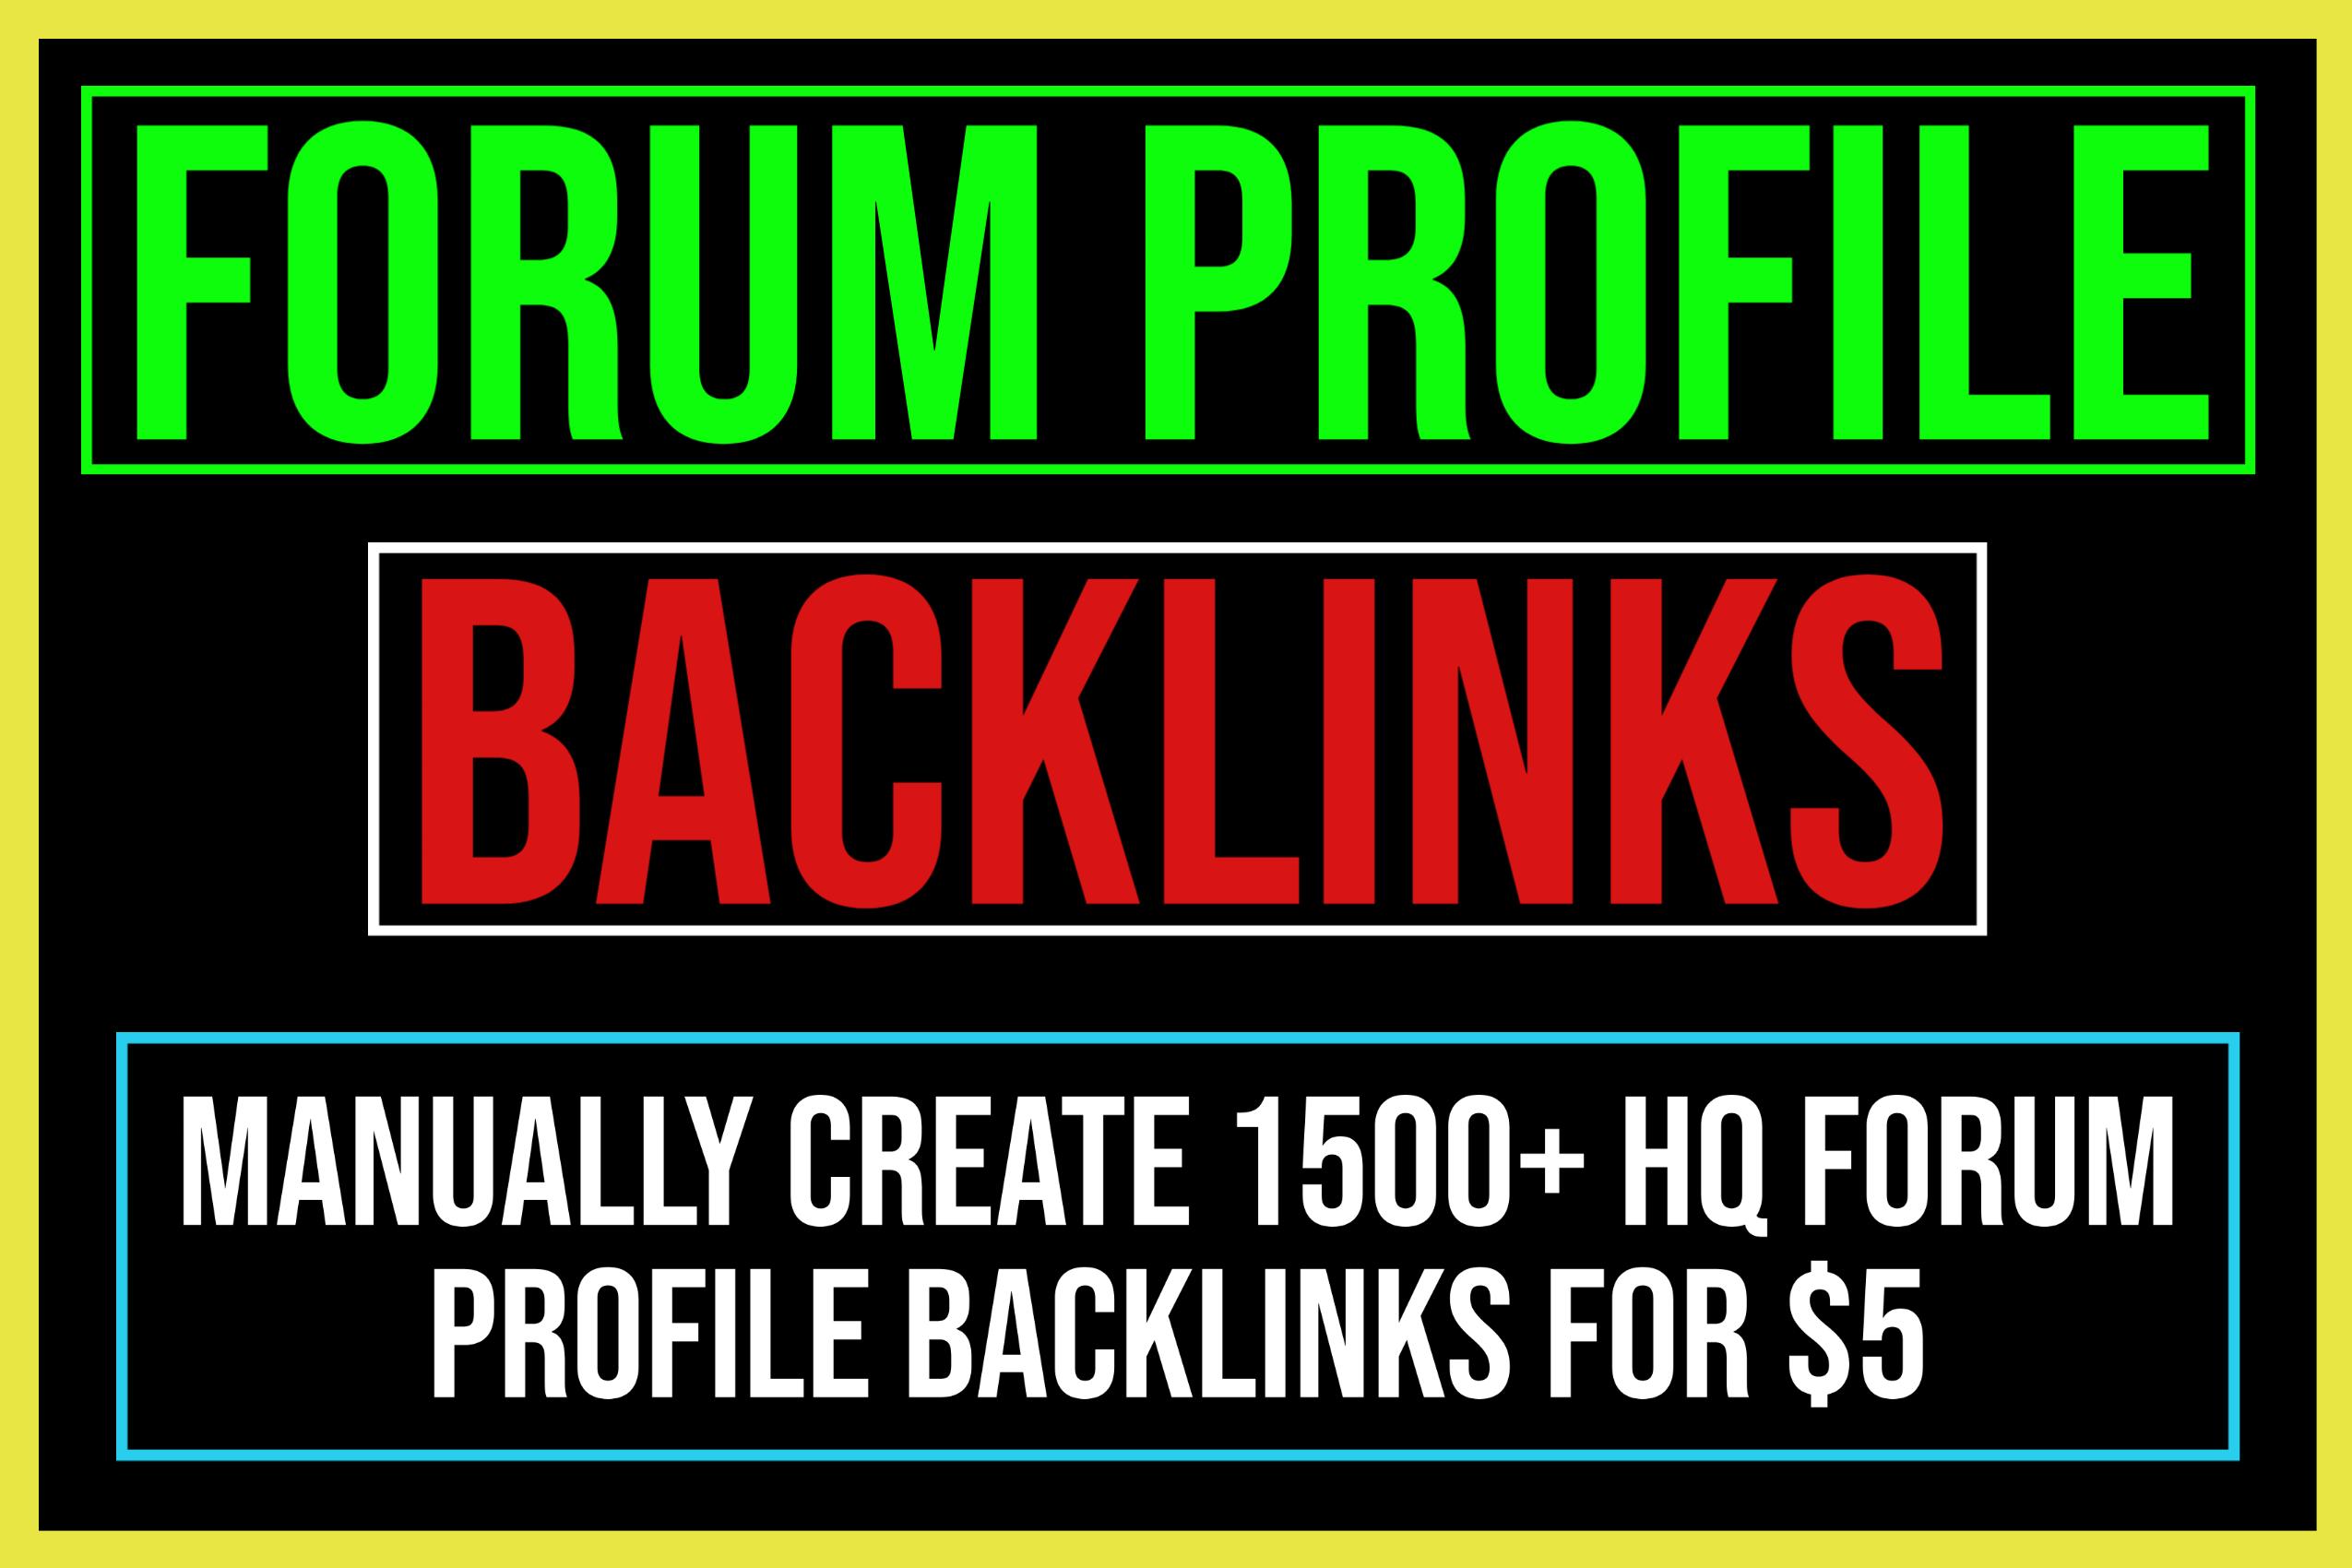 Create 1500 Forum Profile Backlinks On High PA DA Sites